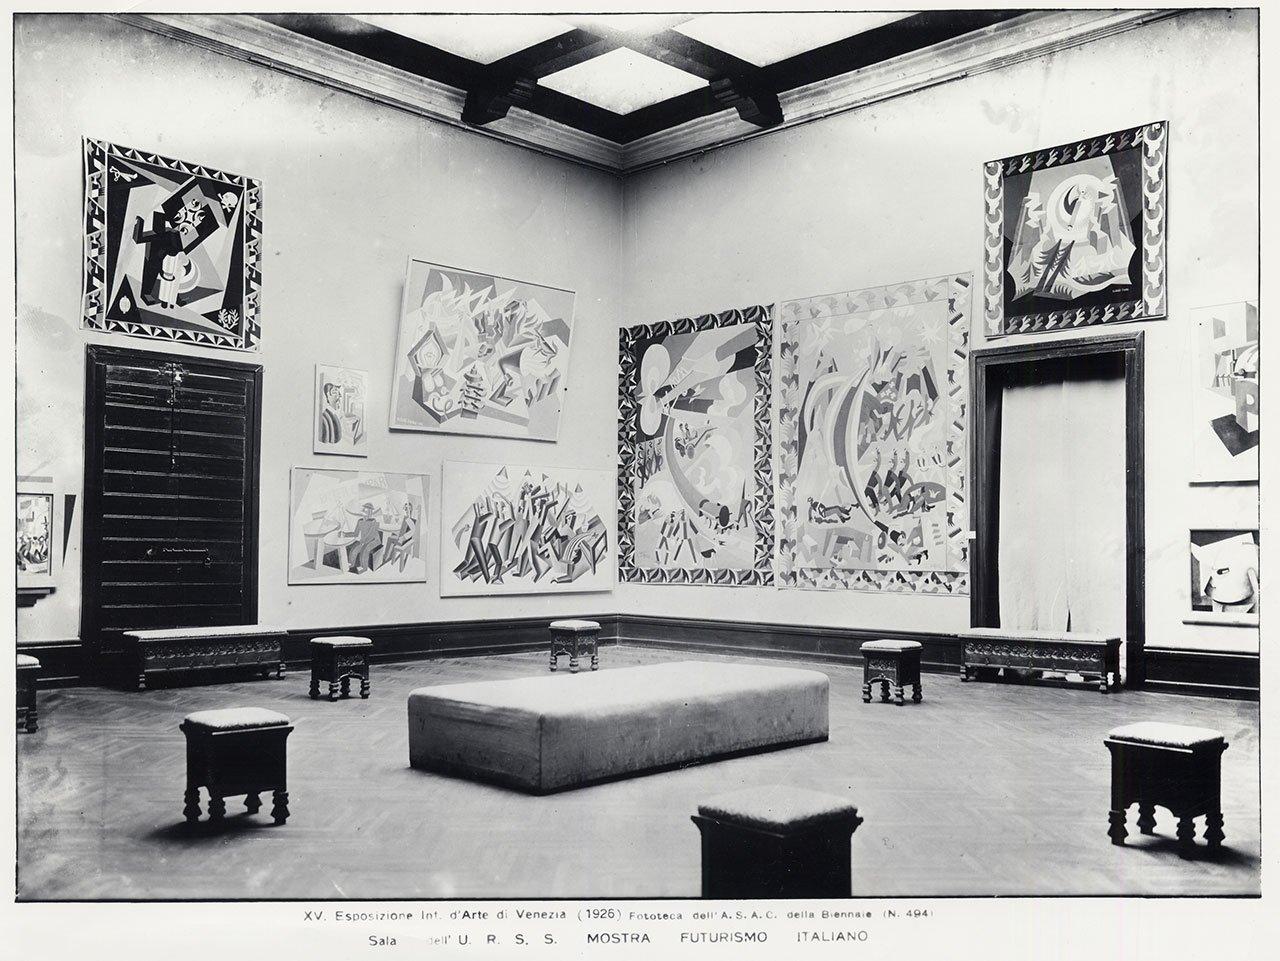 Italian Futurist Exhibition, 1926 Venezia